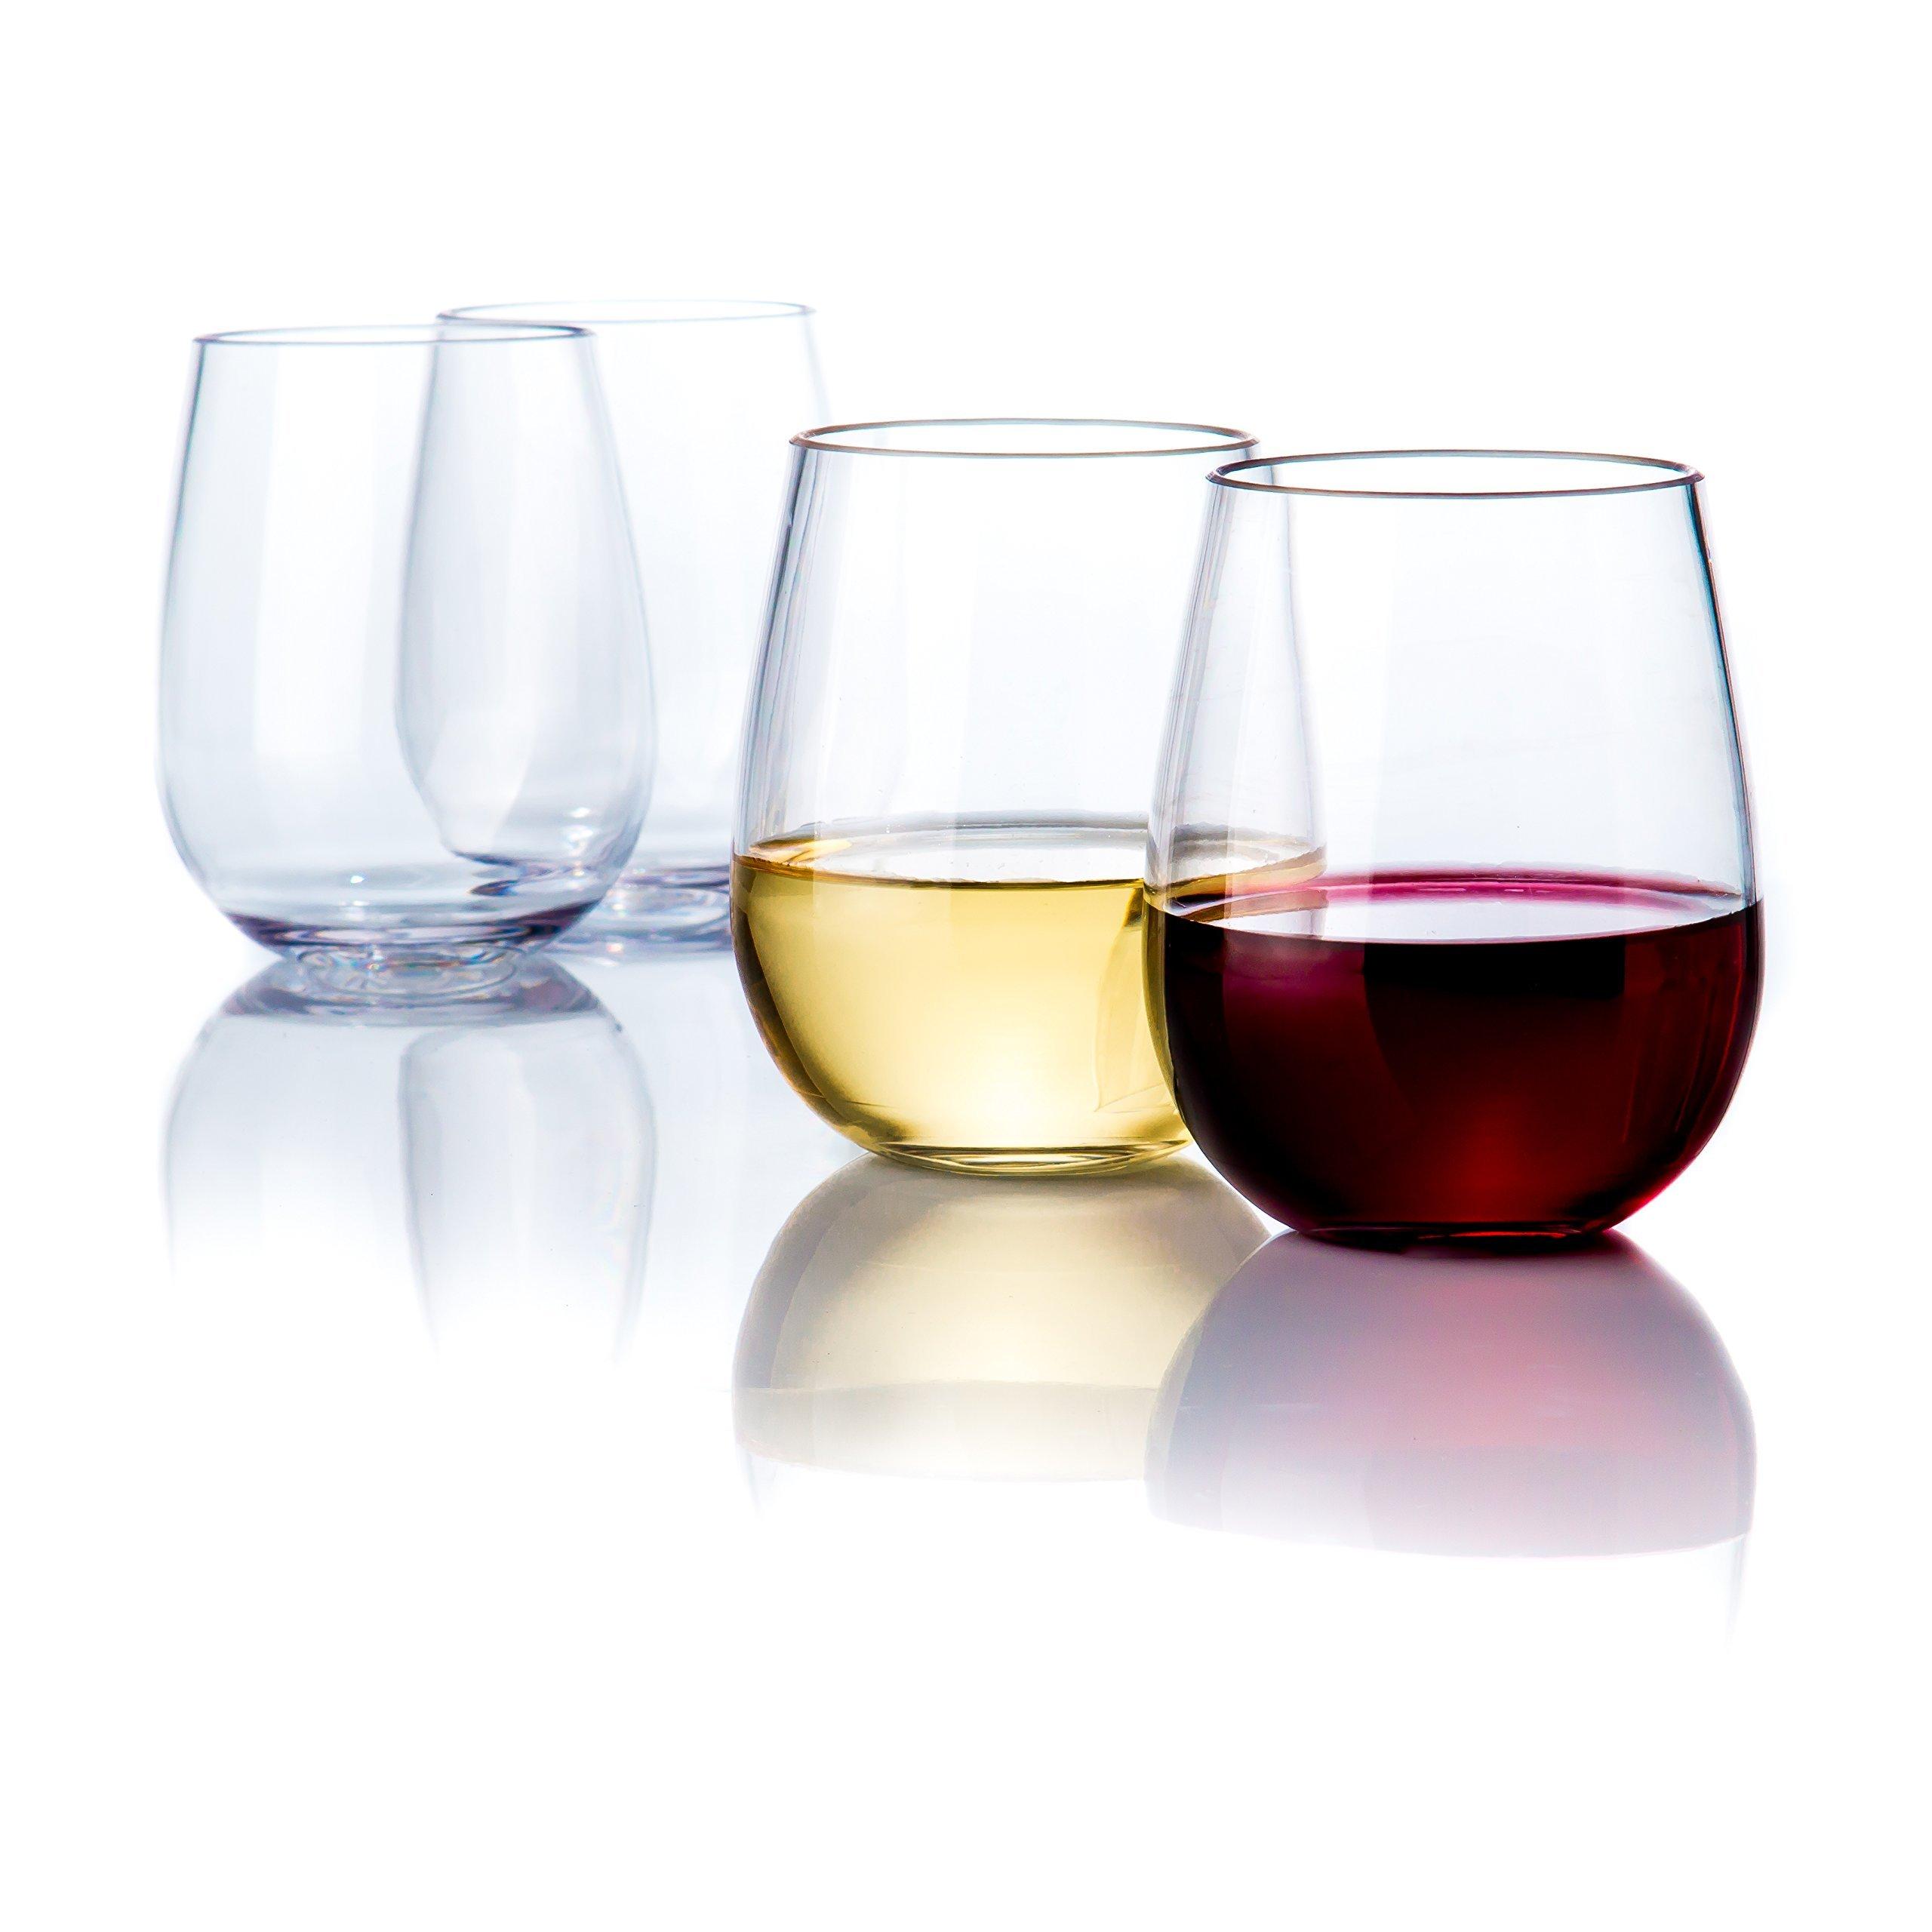 Elegant Stemless Plastic Wine Glasses by Savona | Unbreakable Wine Glasses | Ideal for Indoor/Outdoor Use | Dishwasher Safe | 100% Tritan Shatterproof Wine Glasses | Set of 4